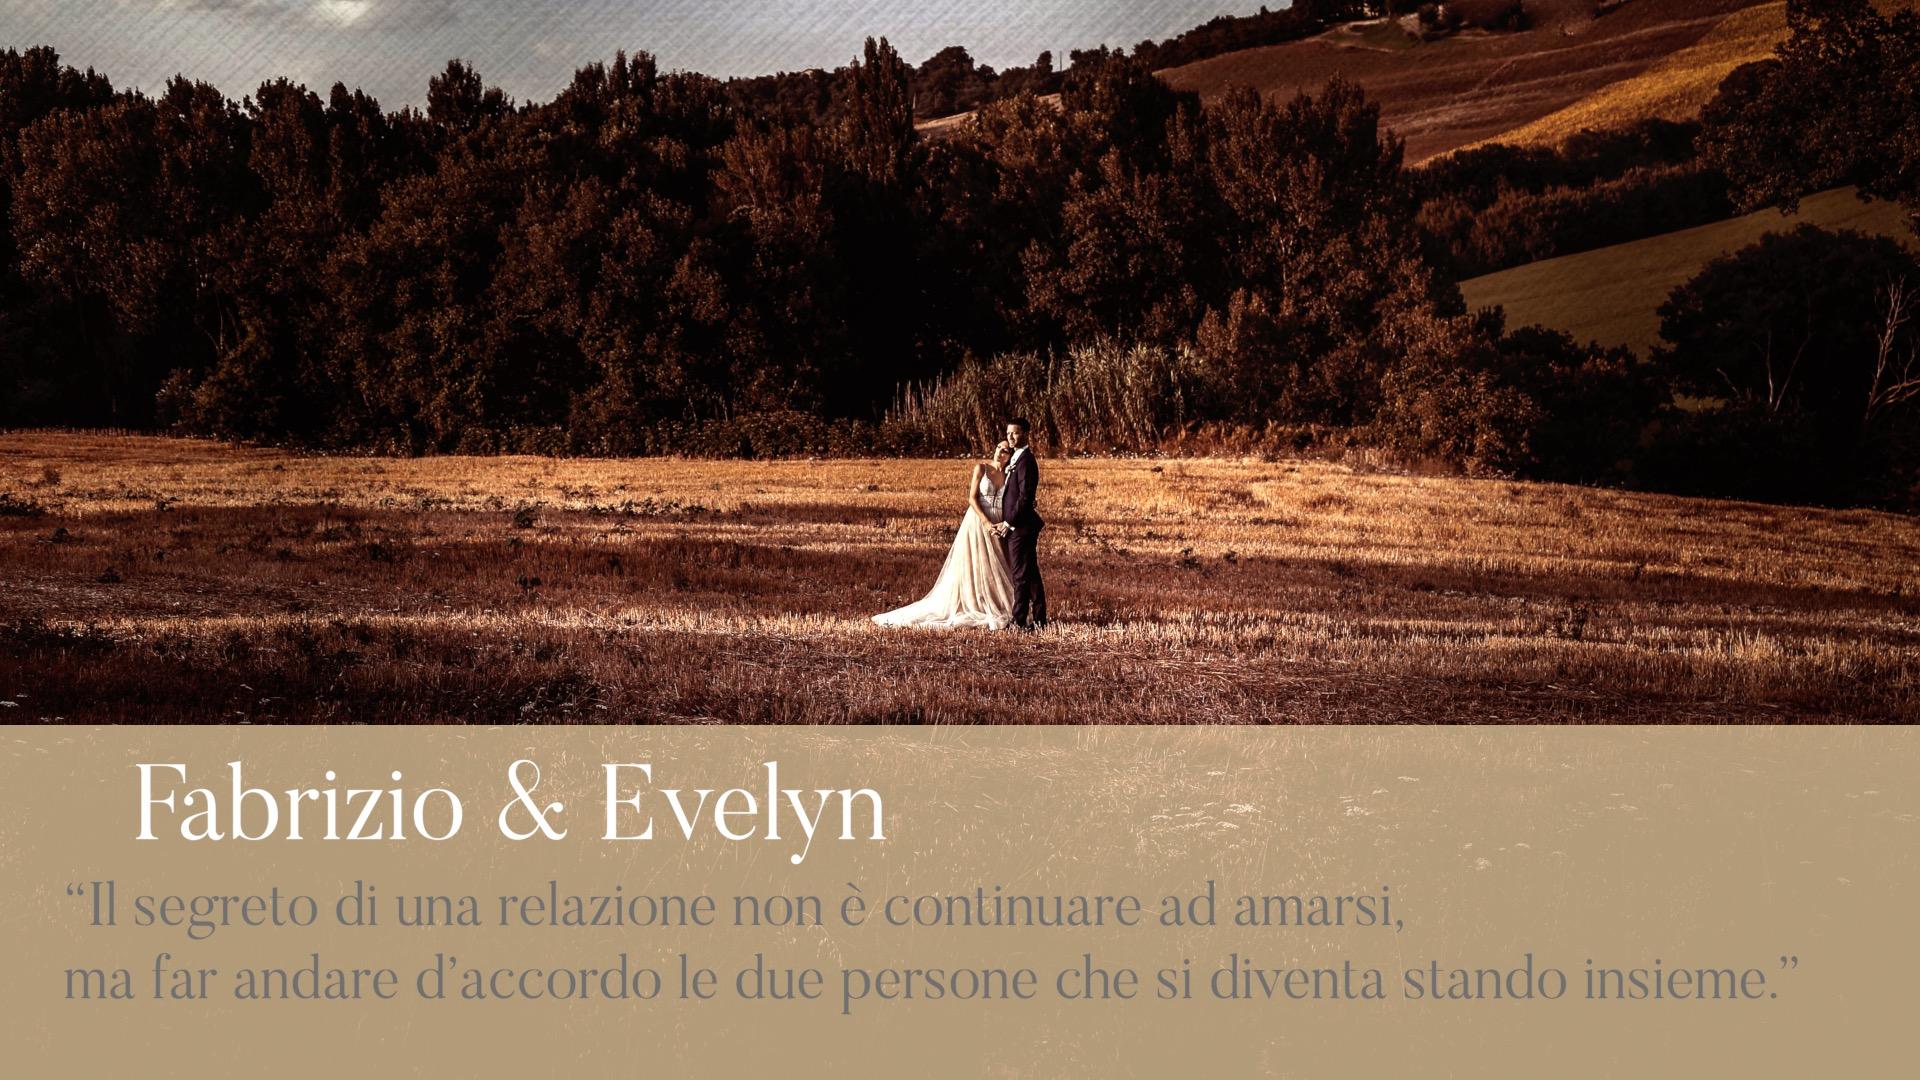 Fabrizio ed Evelyn